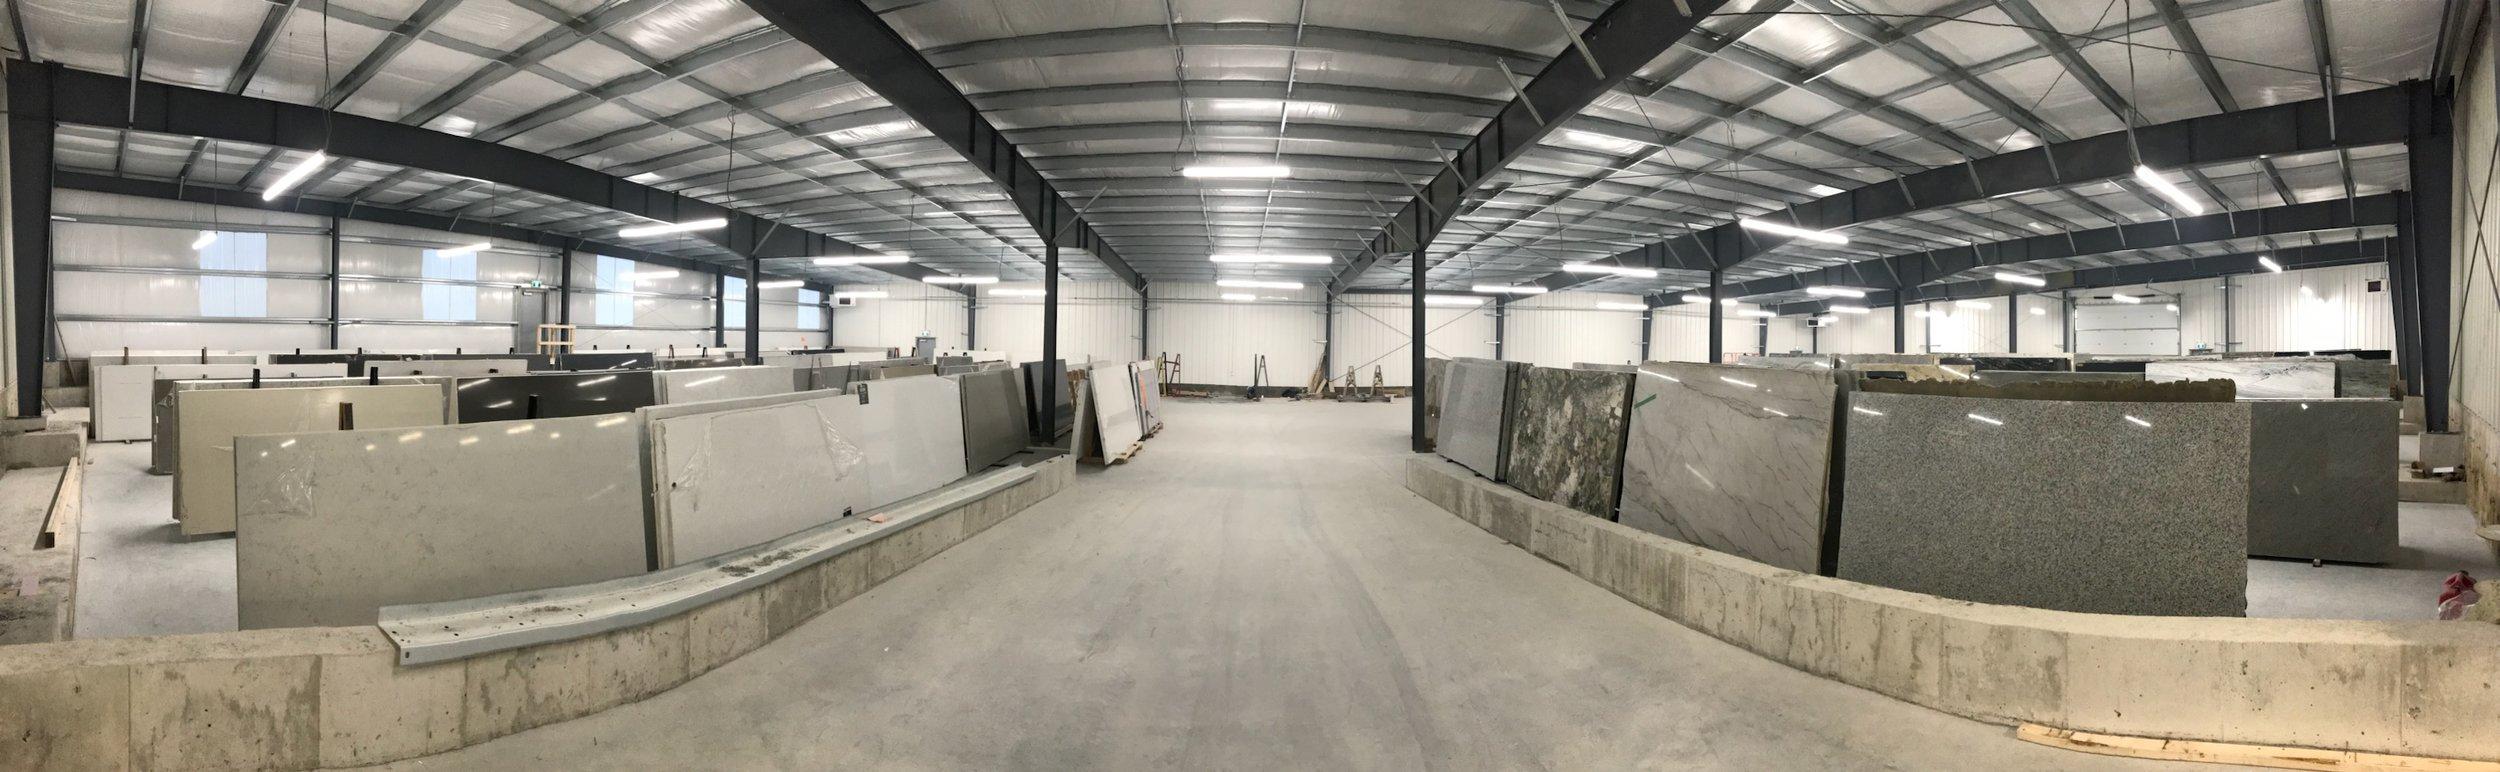 Phase 3 - Warehouse.jpg